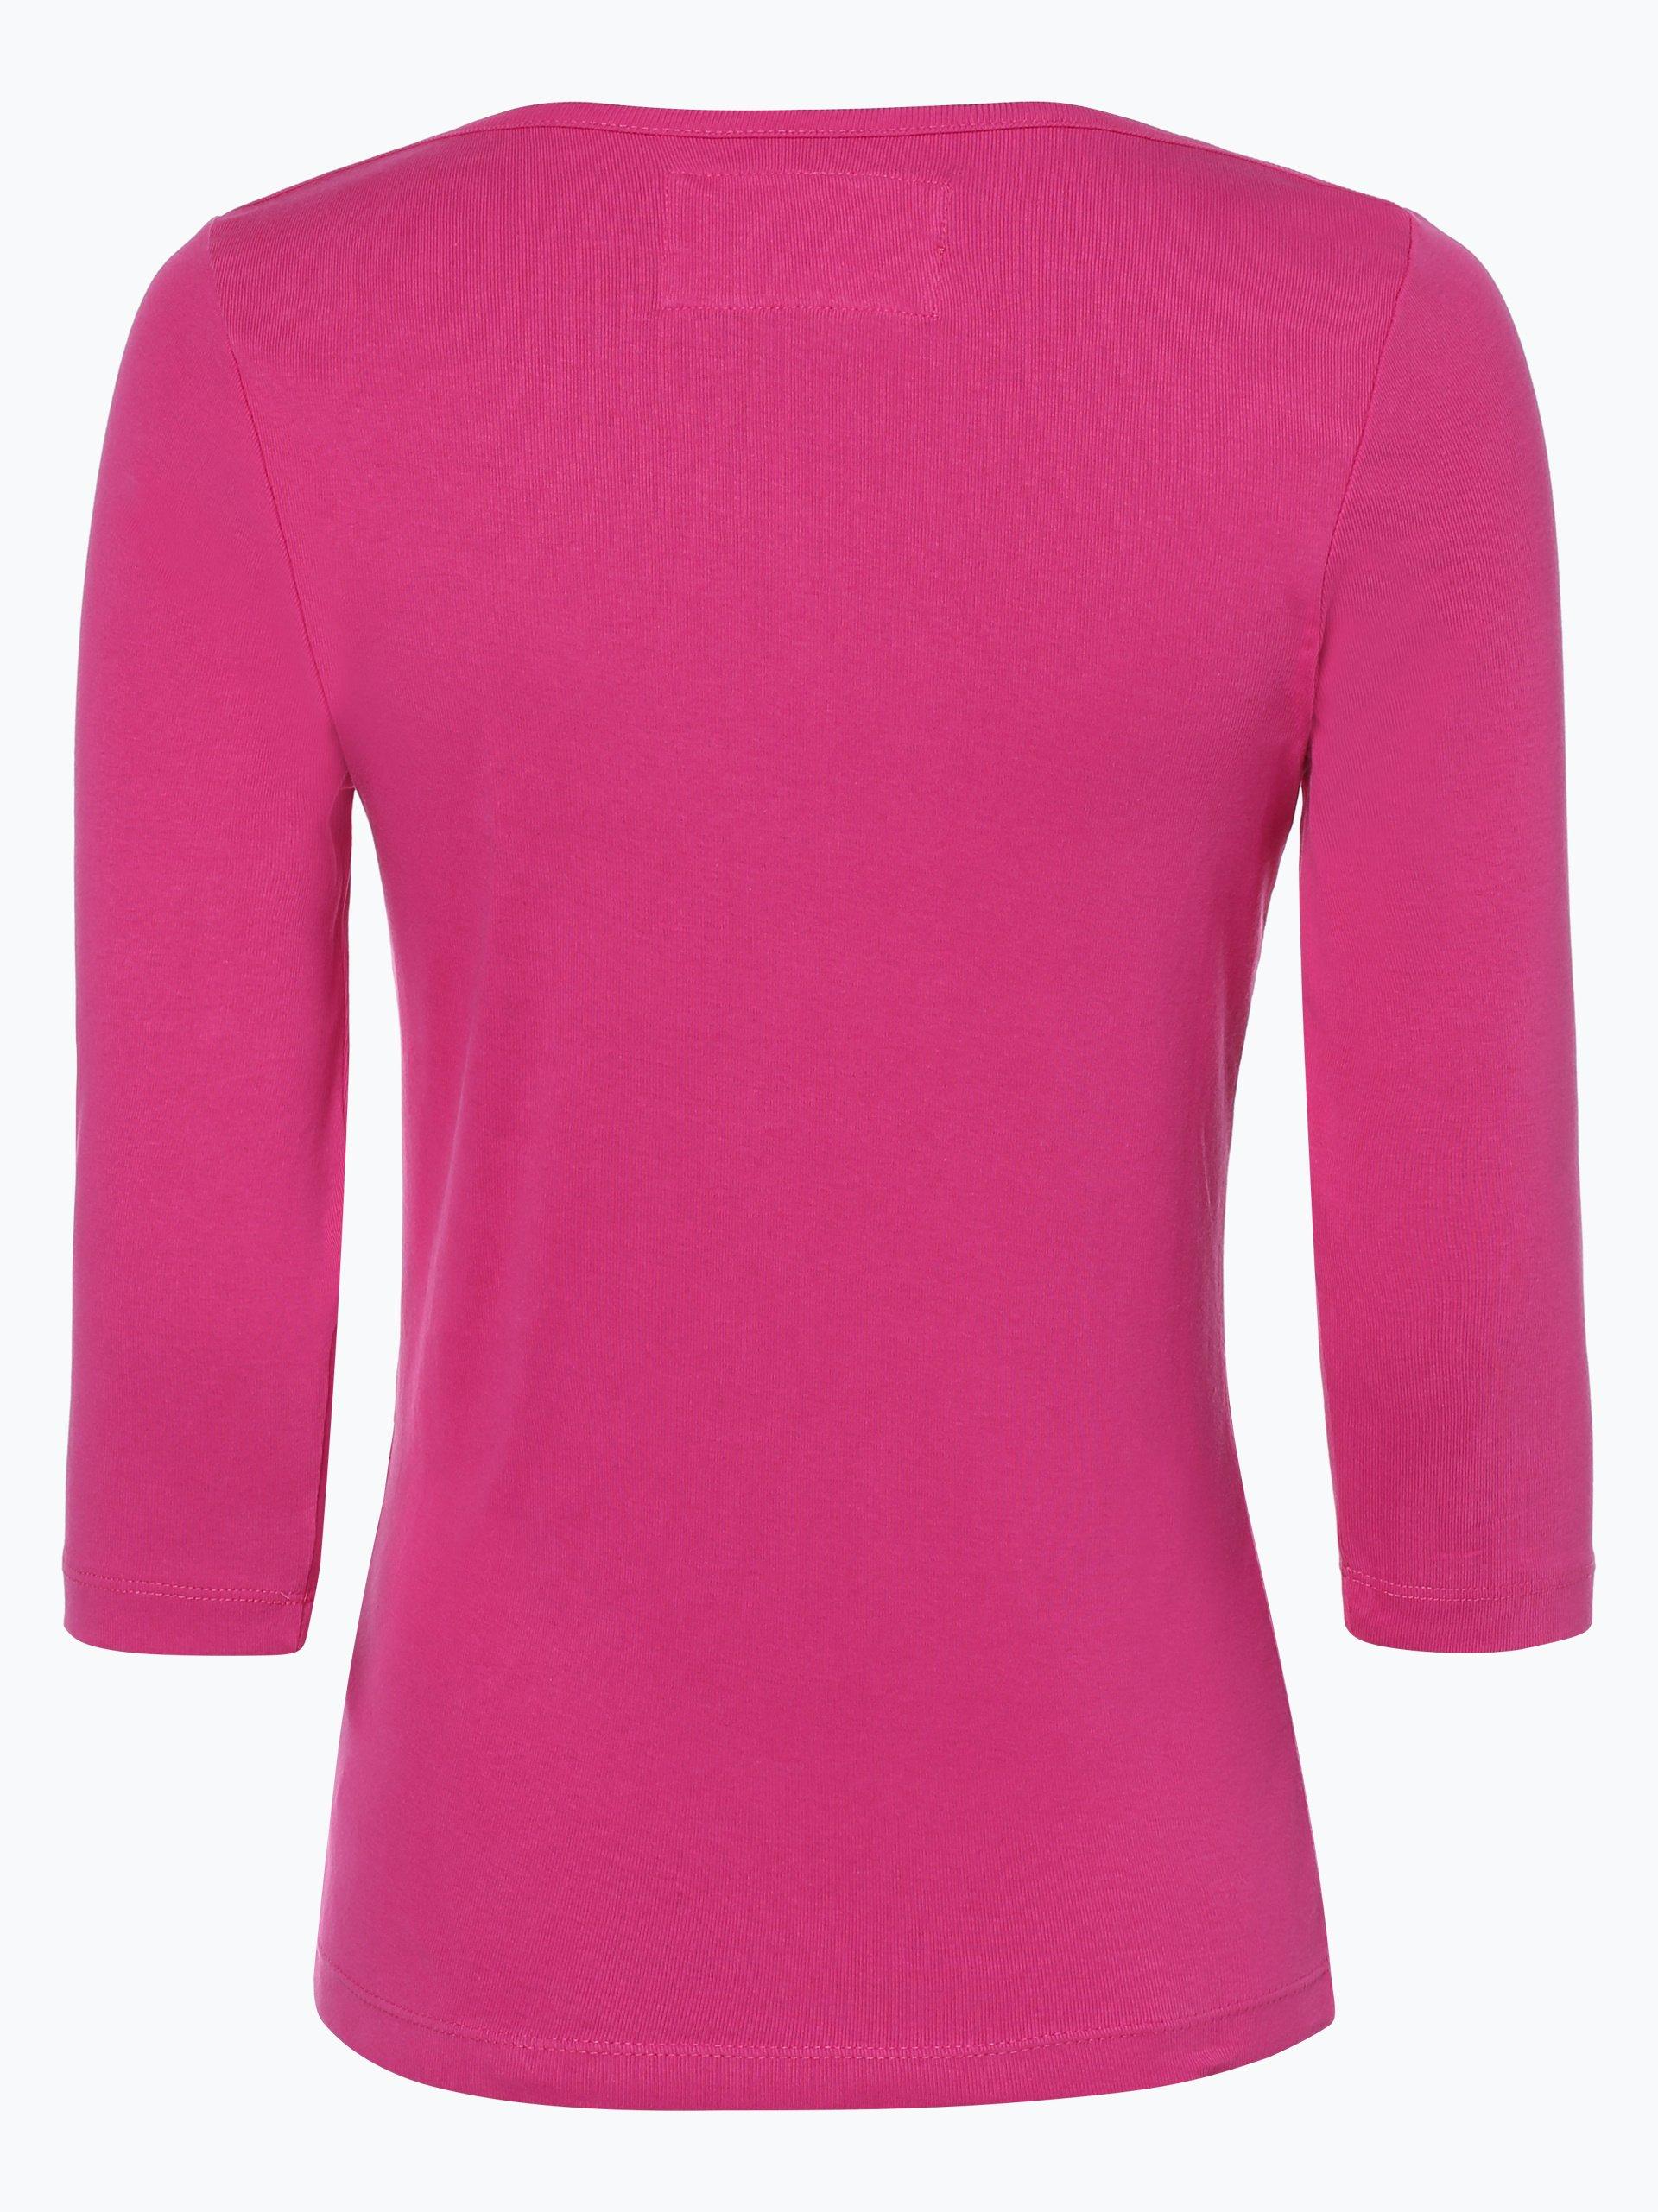 6912641e3753d2 brookshire Damen Shirt fuchsia uni online kaufen